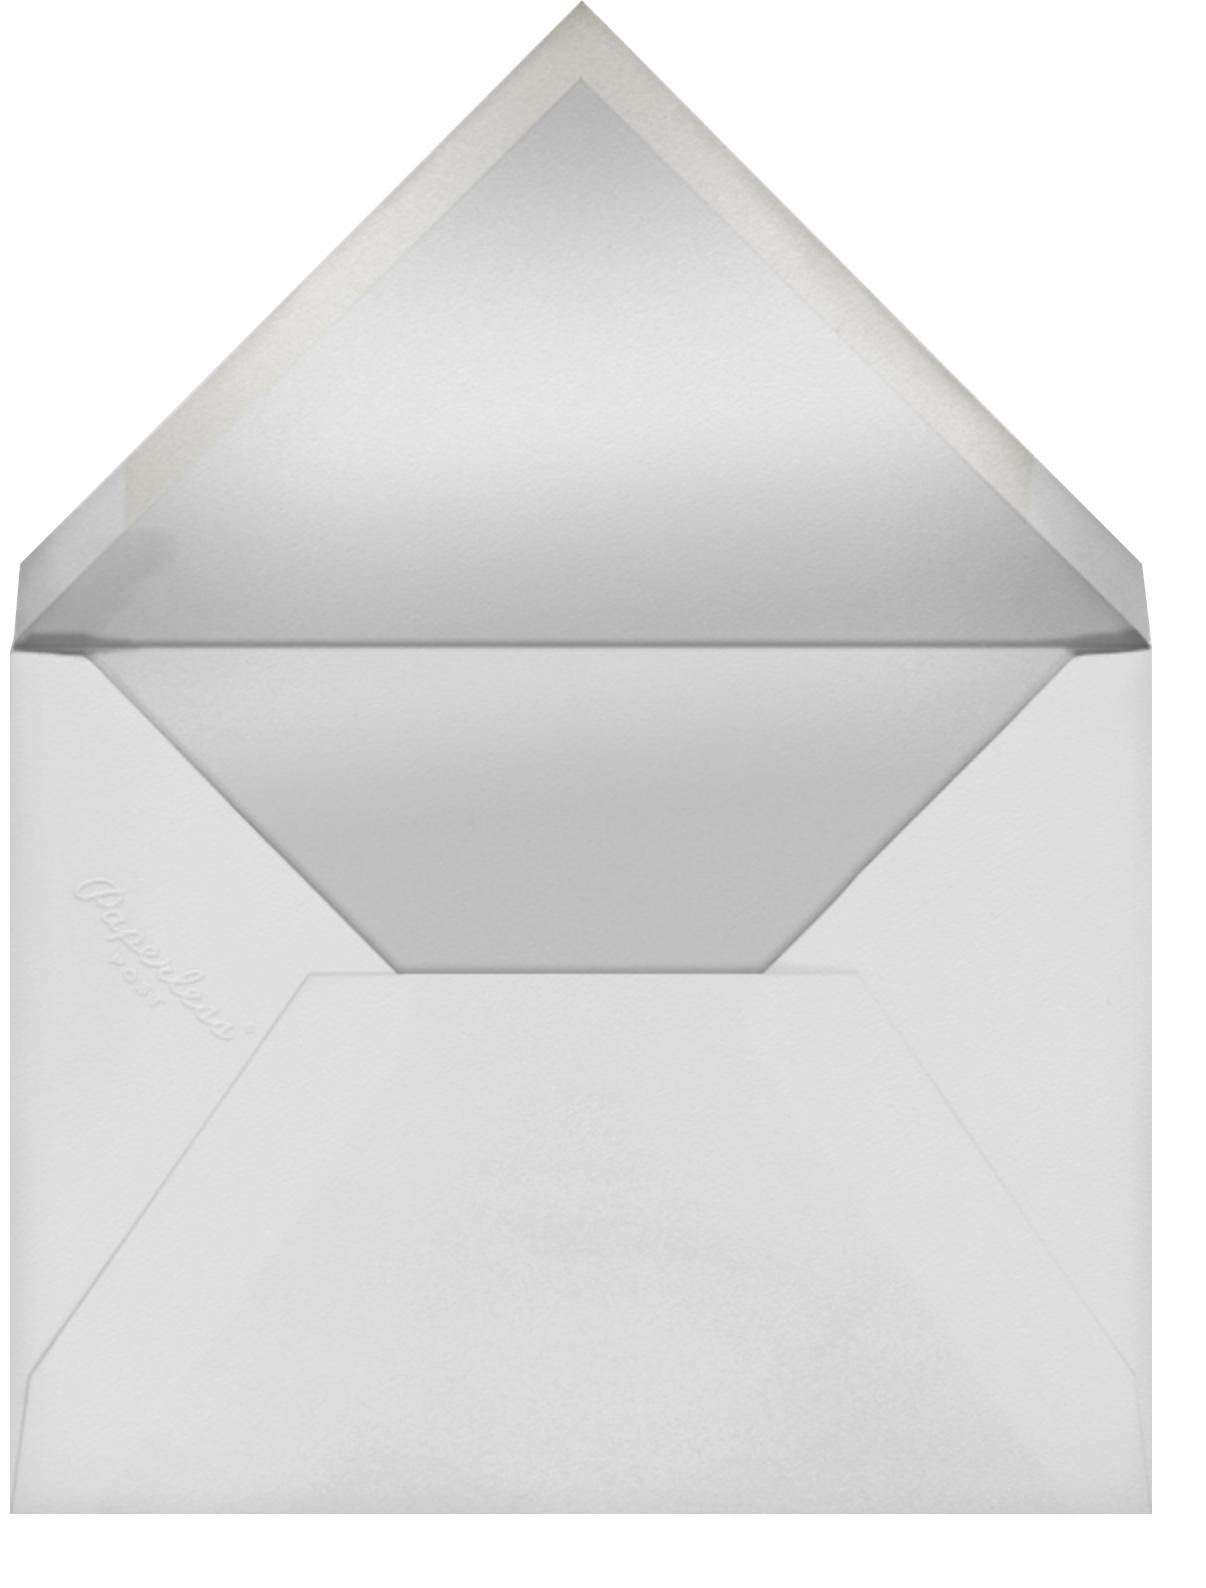 Smudge Border (Horizontal) - Paperless Post - Halloween - envelope back